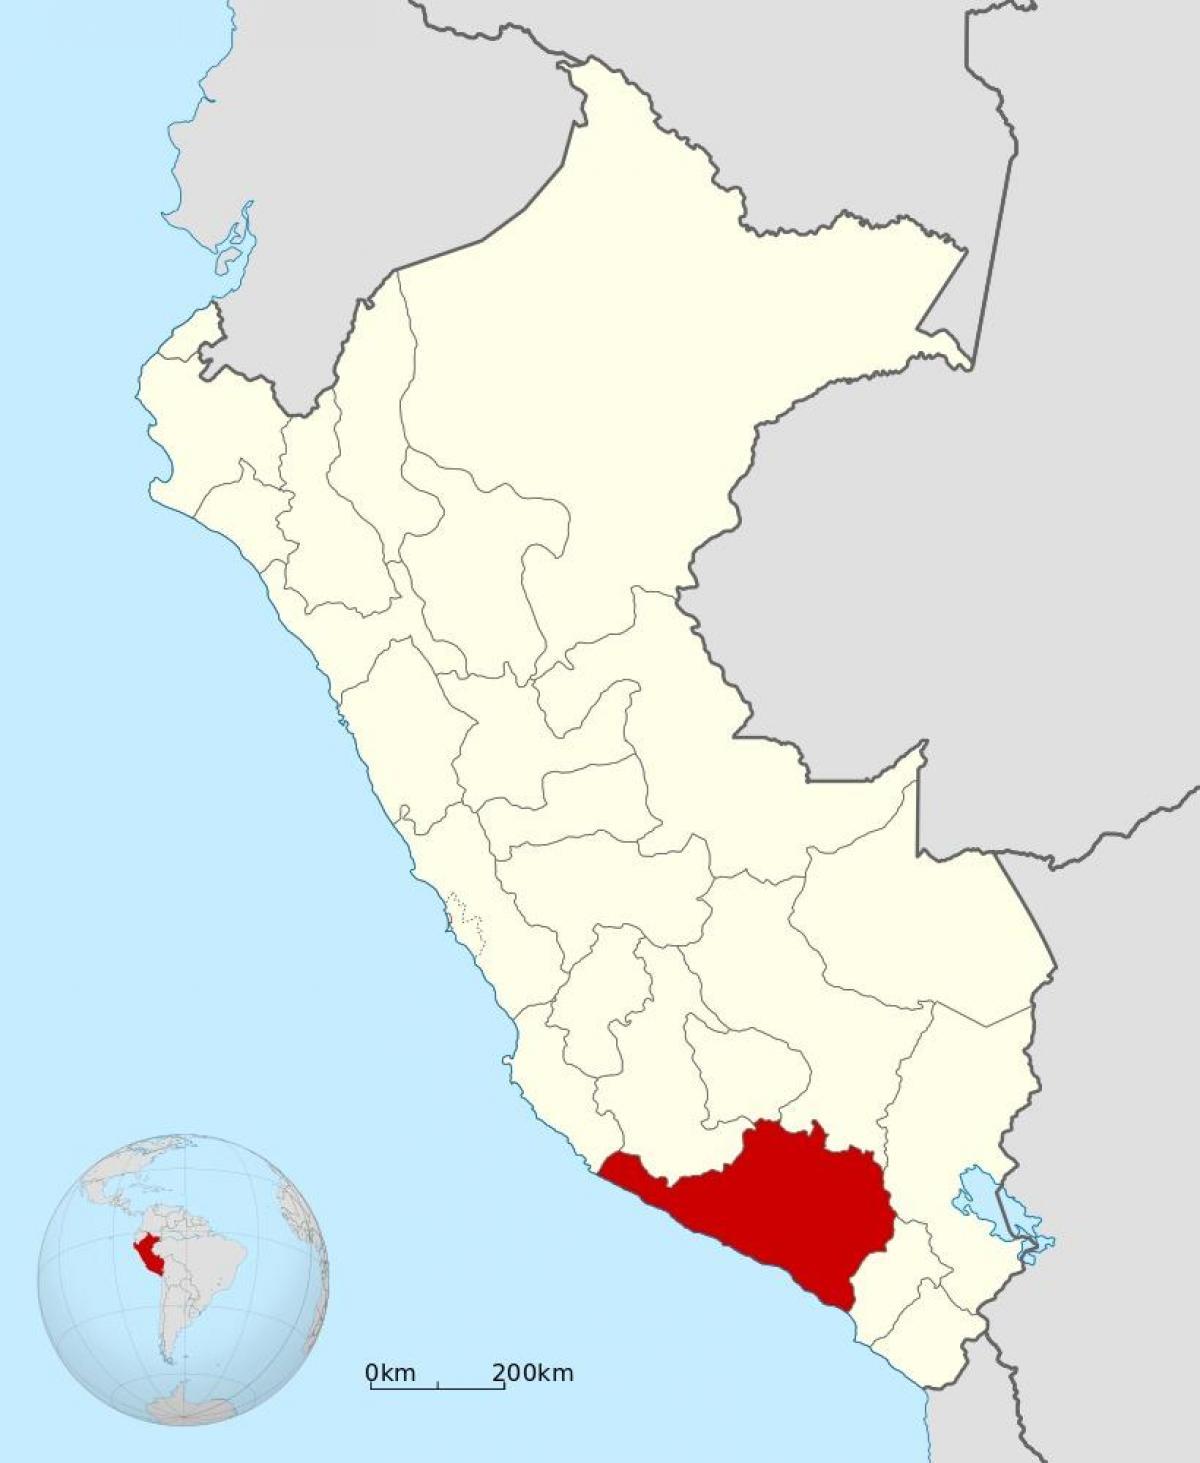 Arequipa Peru Map Arequipa Peru map   Map of arequipa Peru (South America   Americas) Arequipa Peru Map